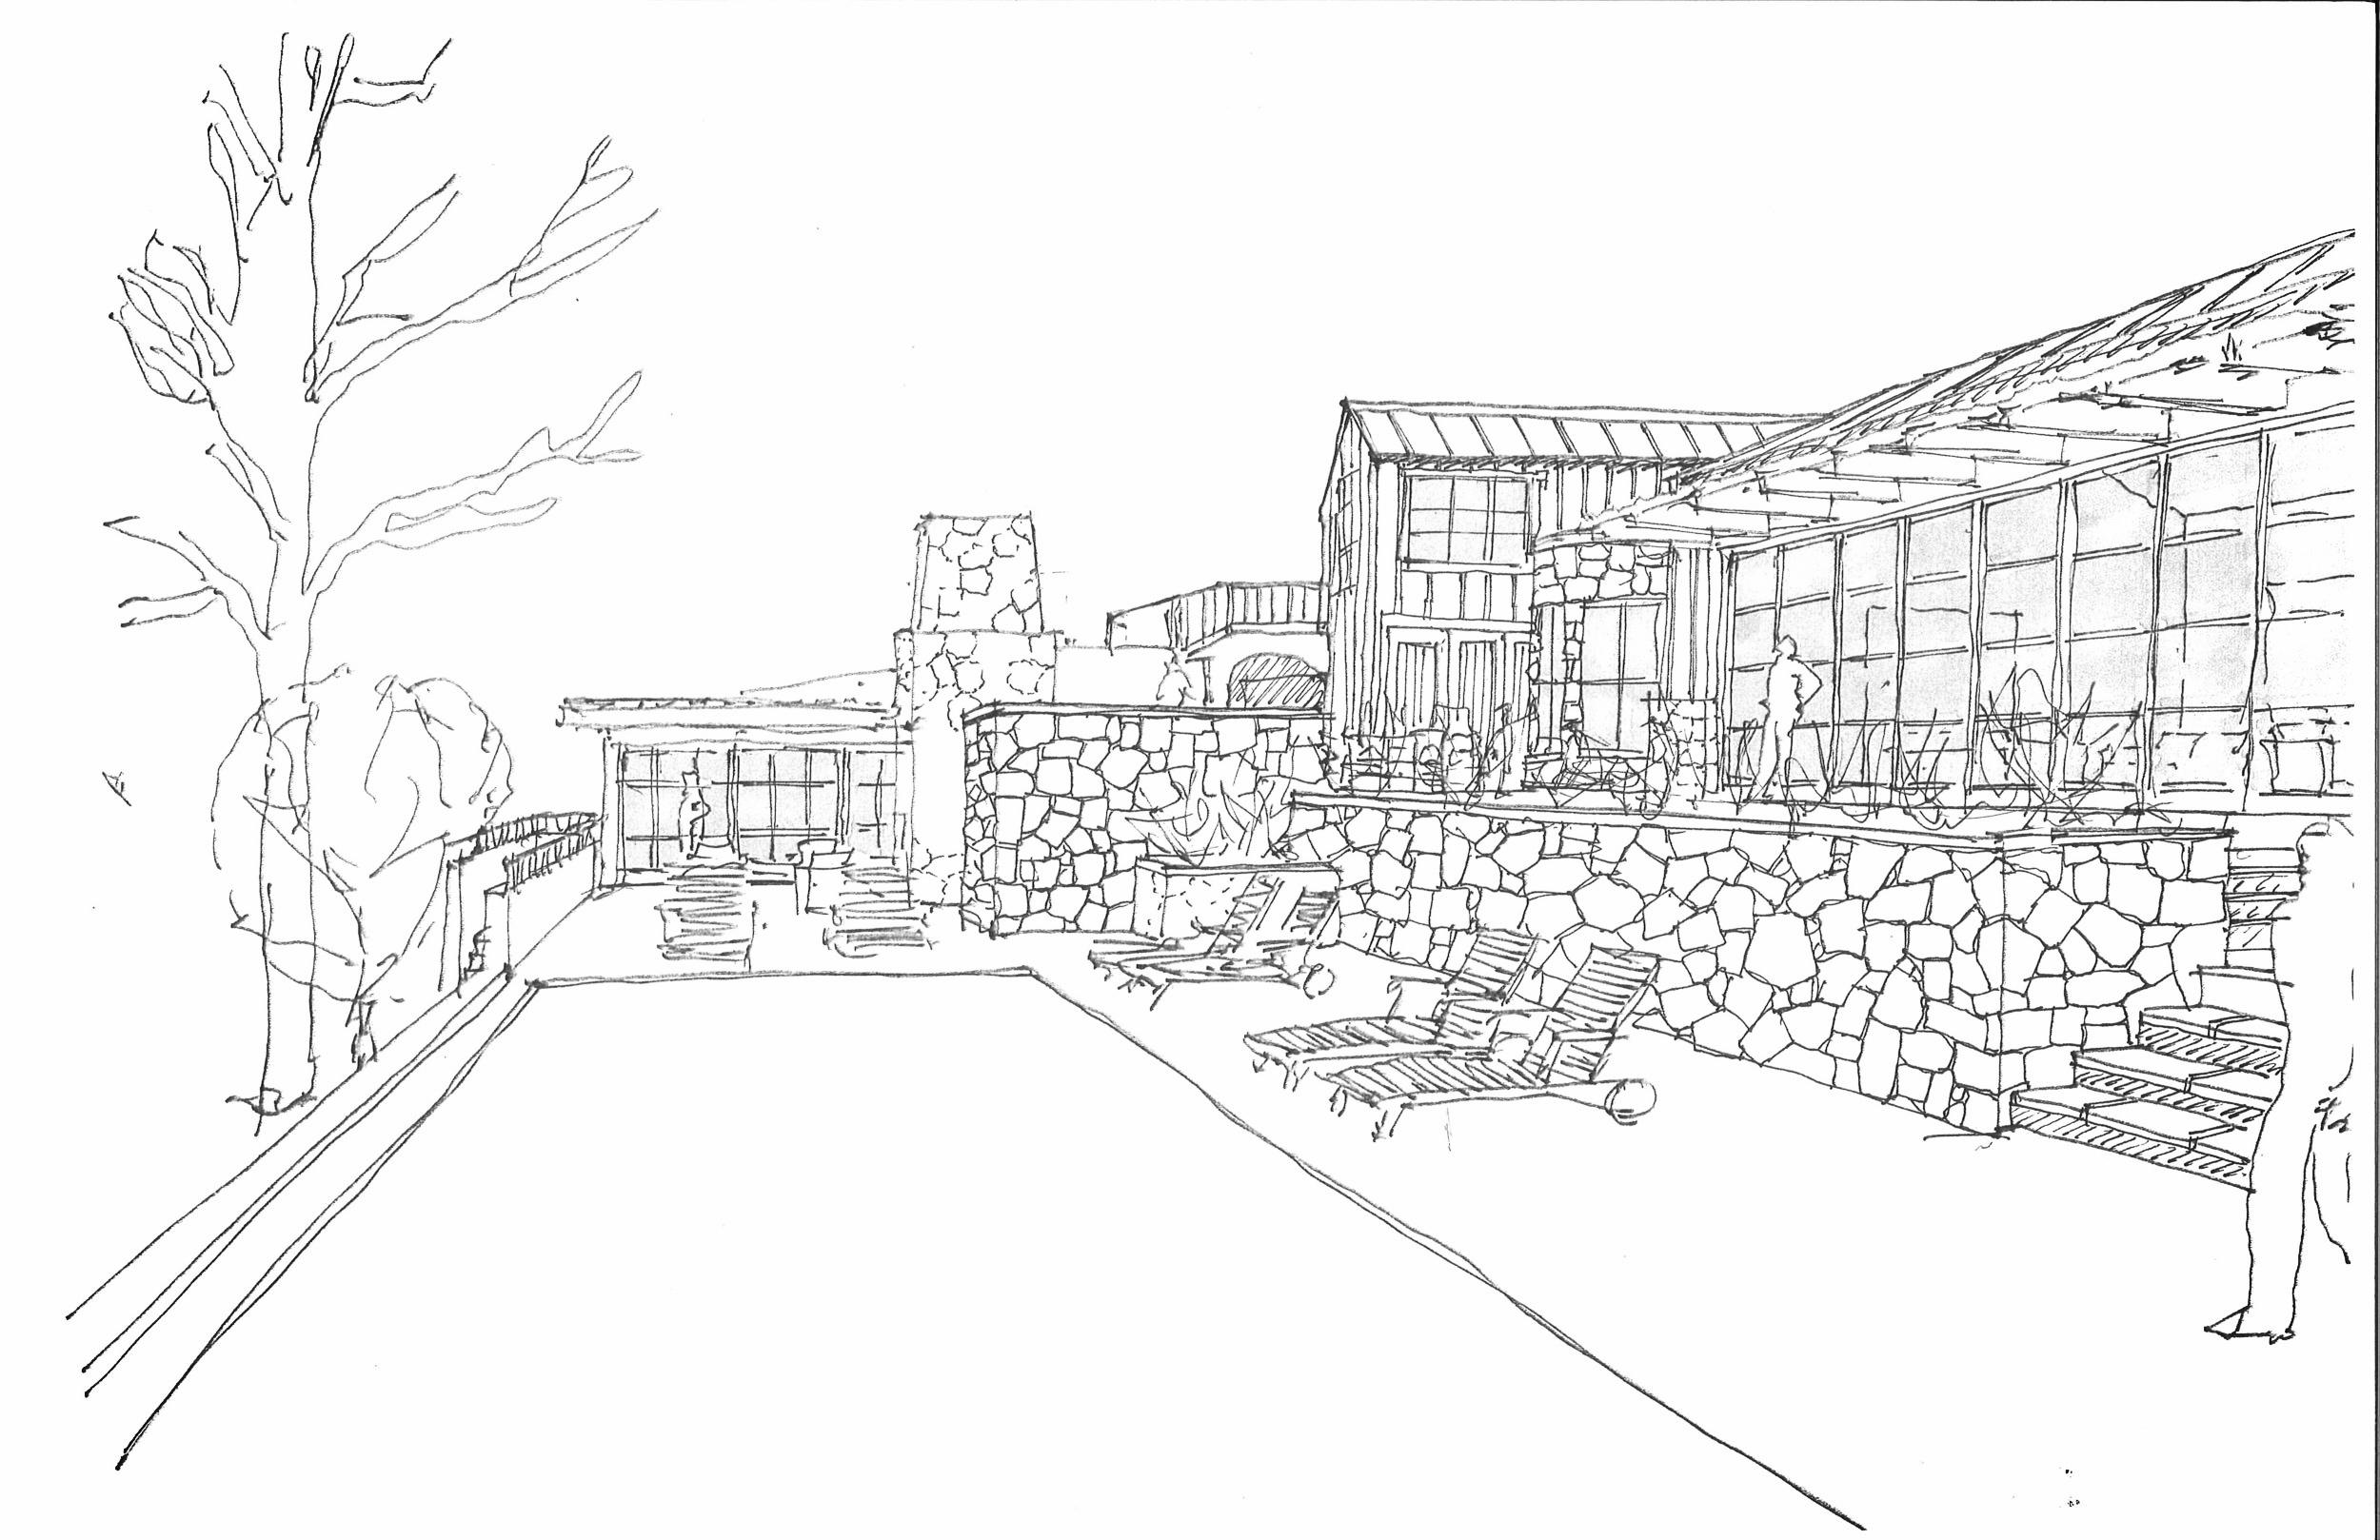 Sketch for New Residence - Montecito, CA